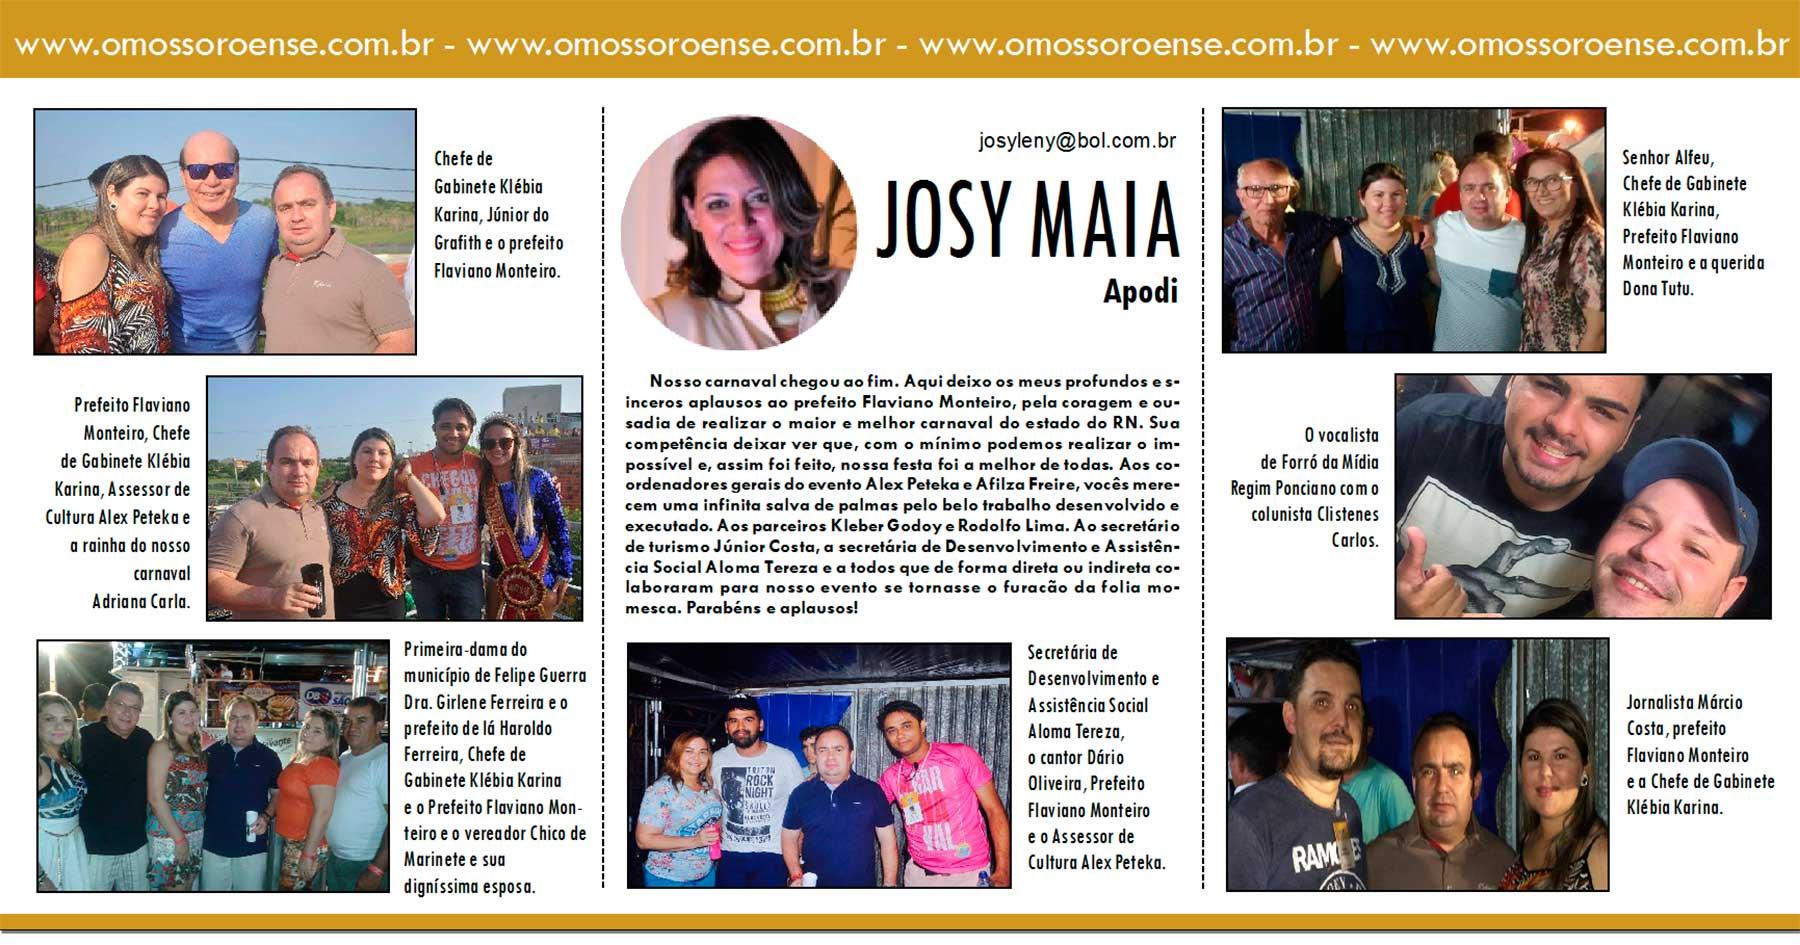 JOSY-MAIA---APODI---13-02